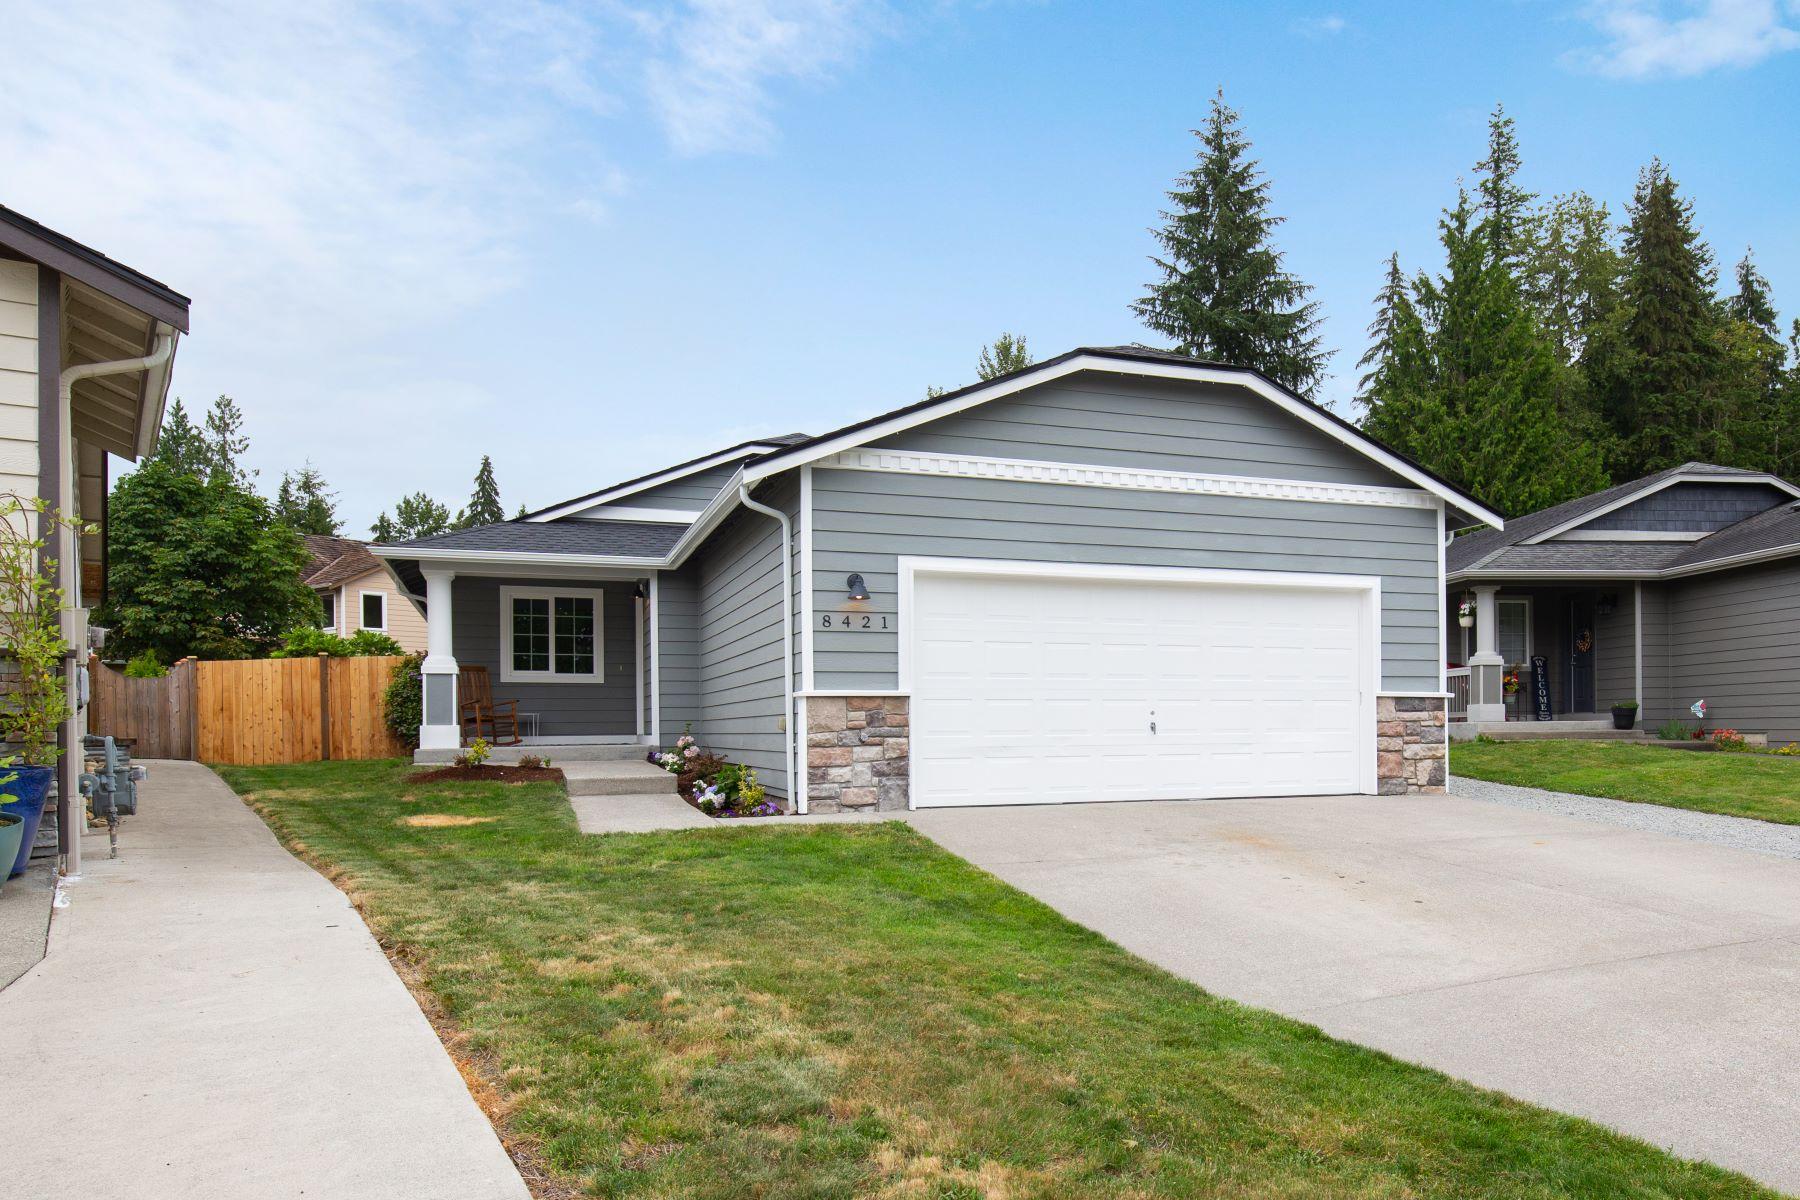 Single Family Homes for Sale at Remodeled Rambler 8421 179th Place NE Arlington, Washington 98223 United States